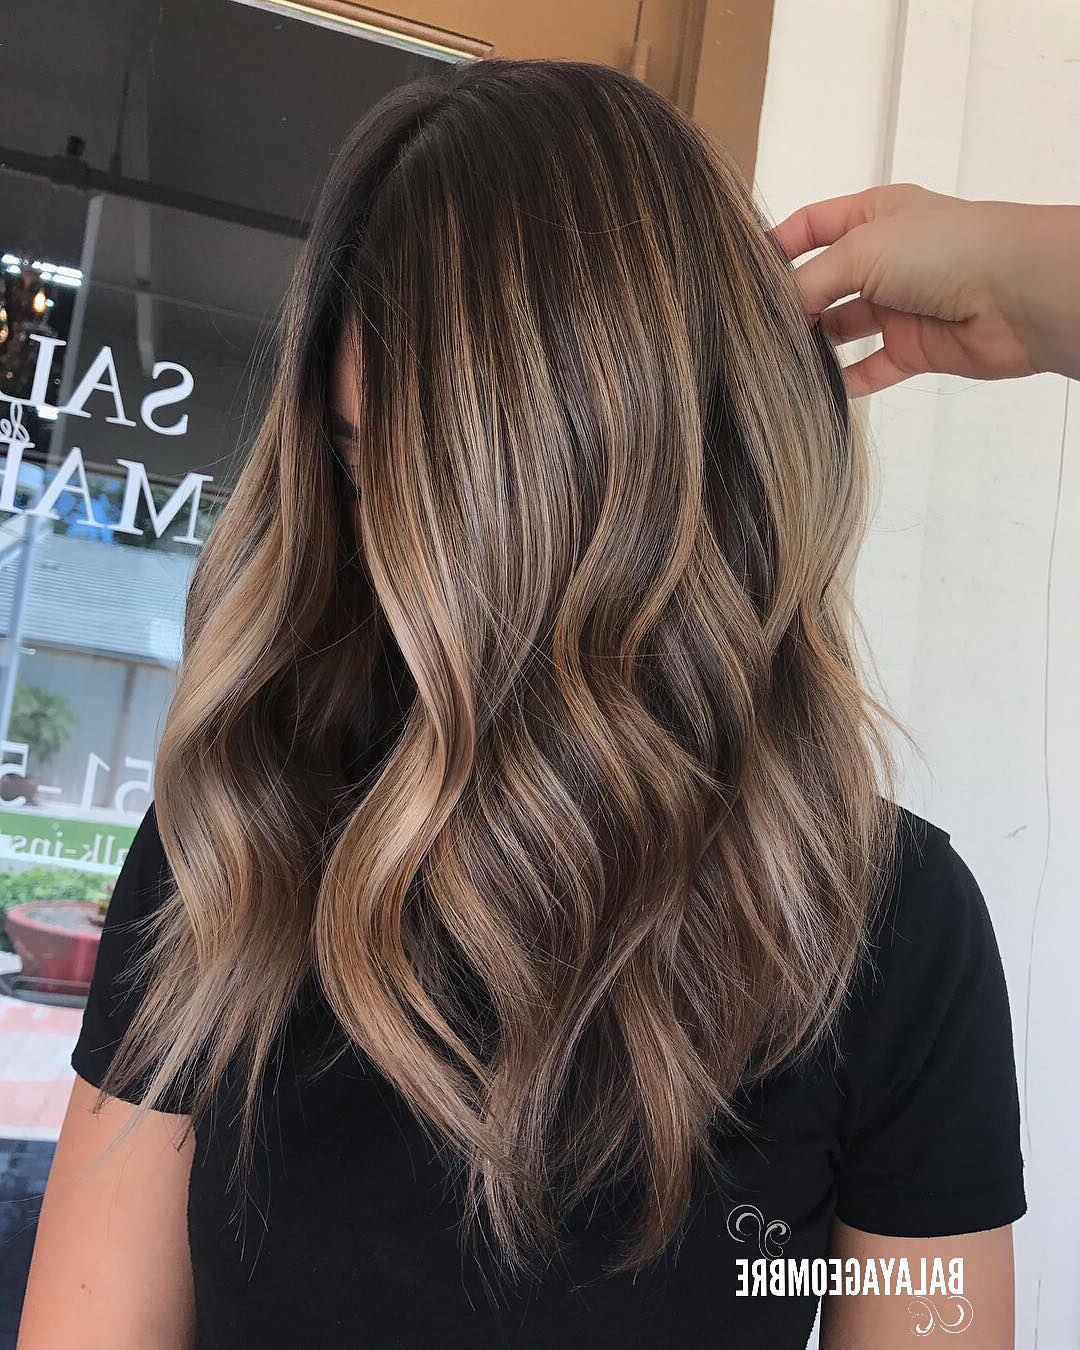 2018 Layered Medium Haircuts In Layered Medium Haircuts For Thick Hair 10 Best Medium Layered (View 3 of 20)